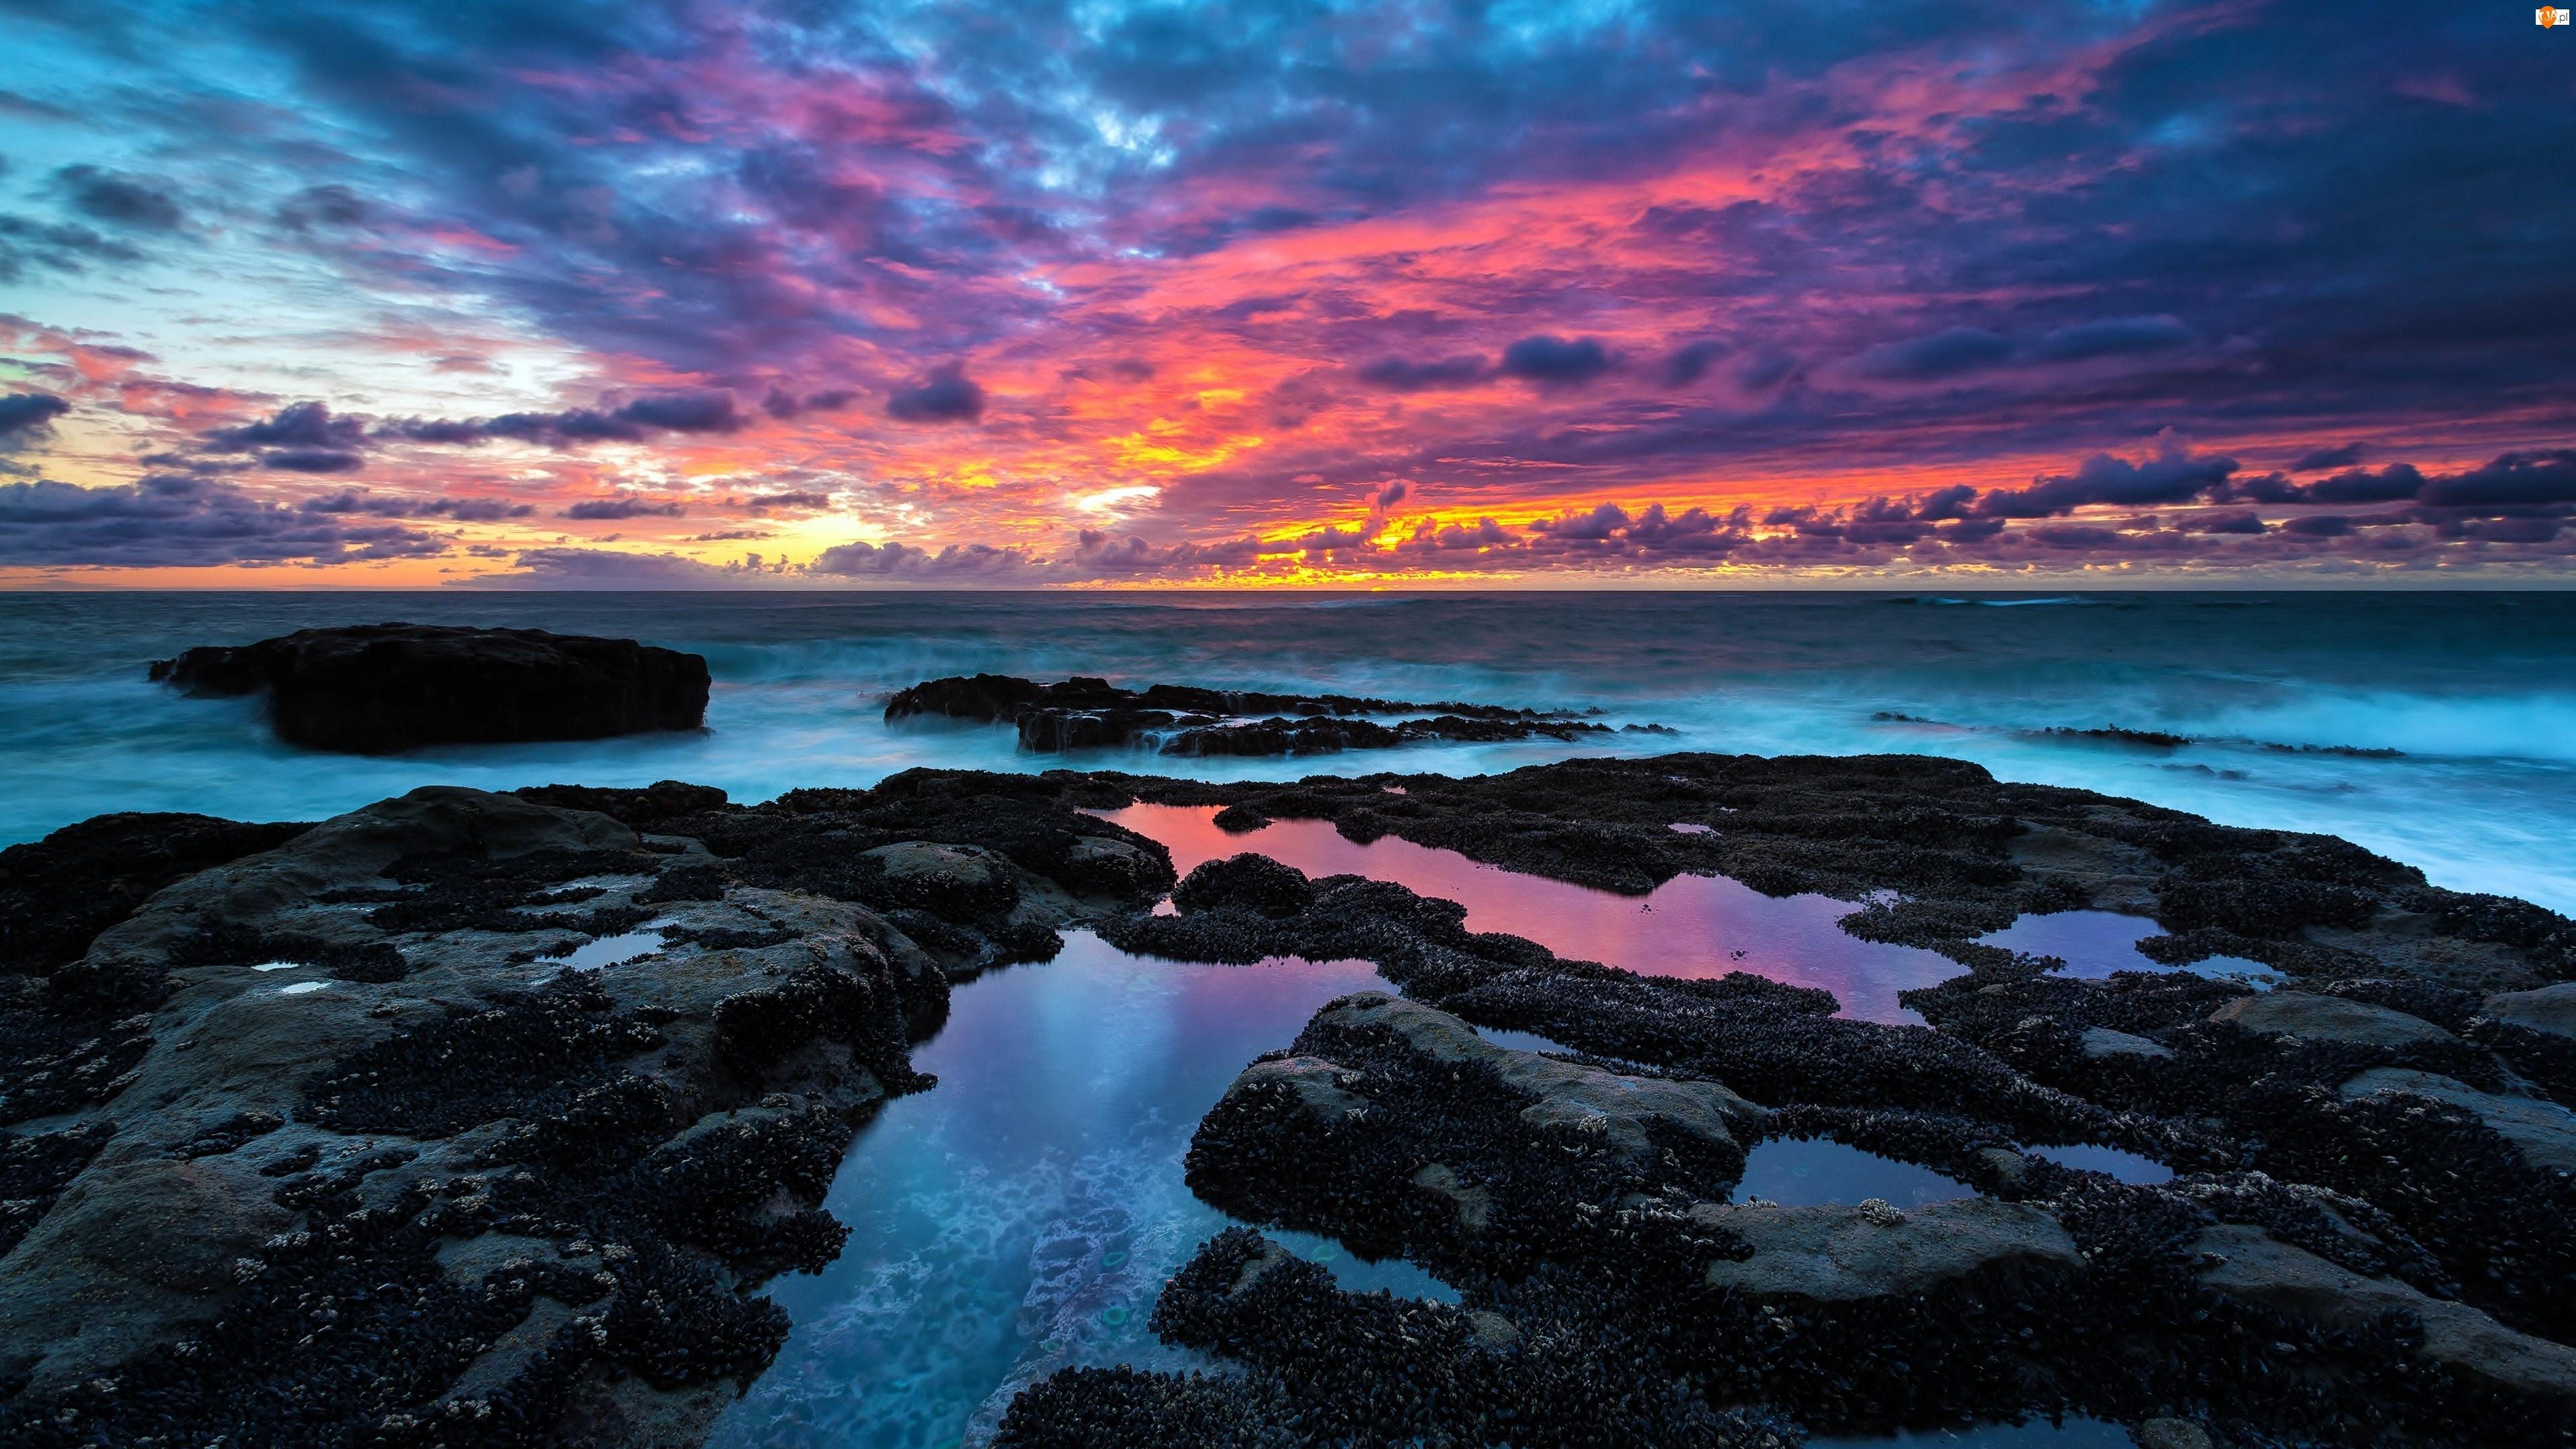 Morze, Chmury, Zachód Słońca